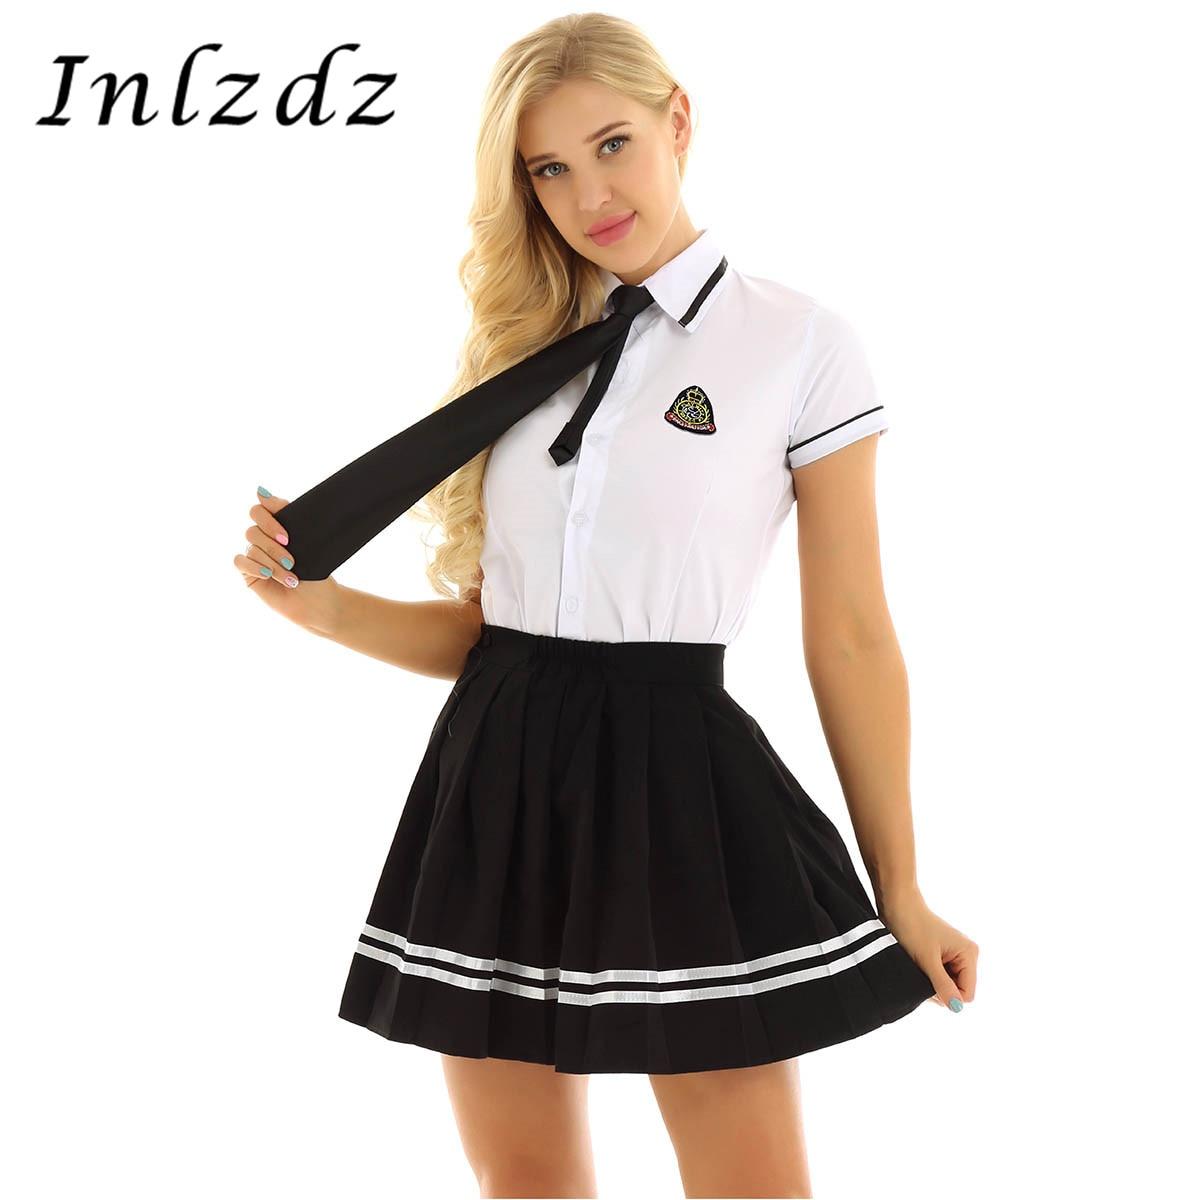 Hentai School Girl English Dub